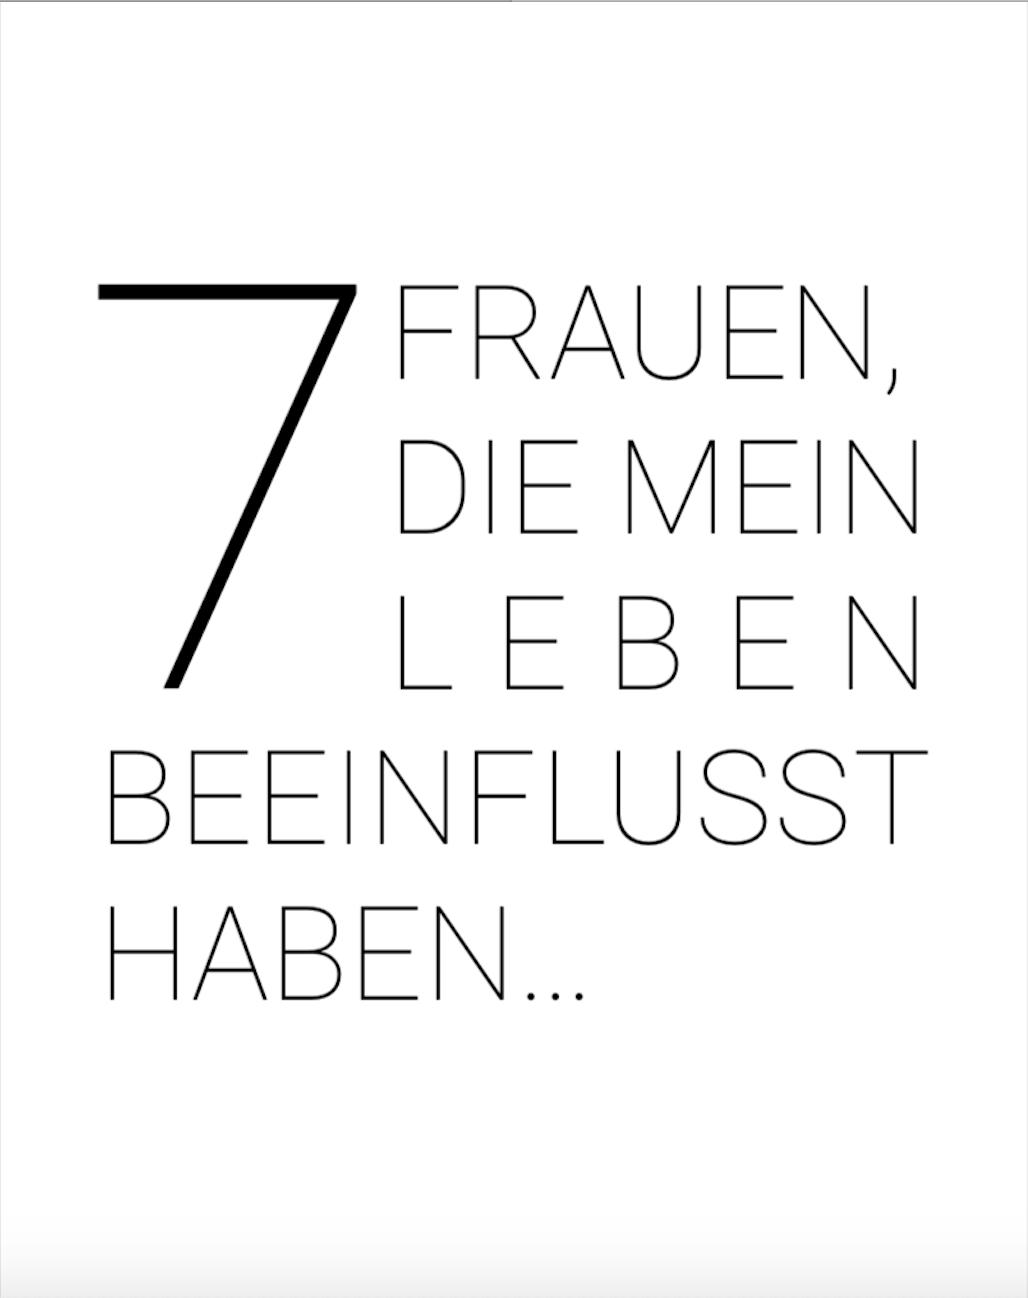 7 Frauen